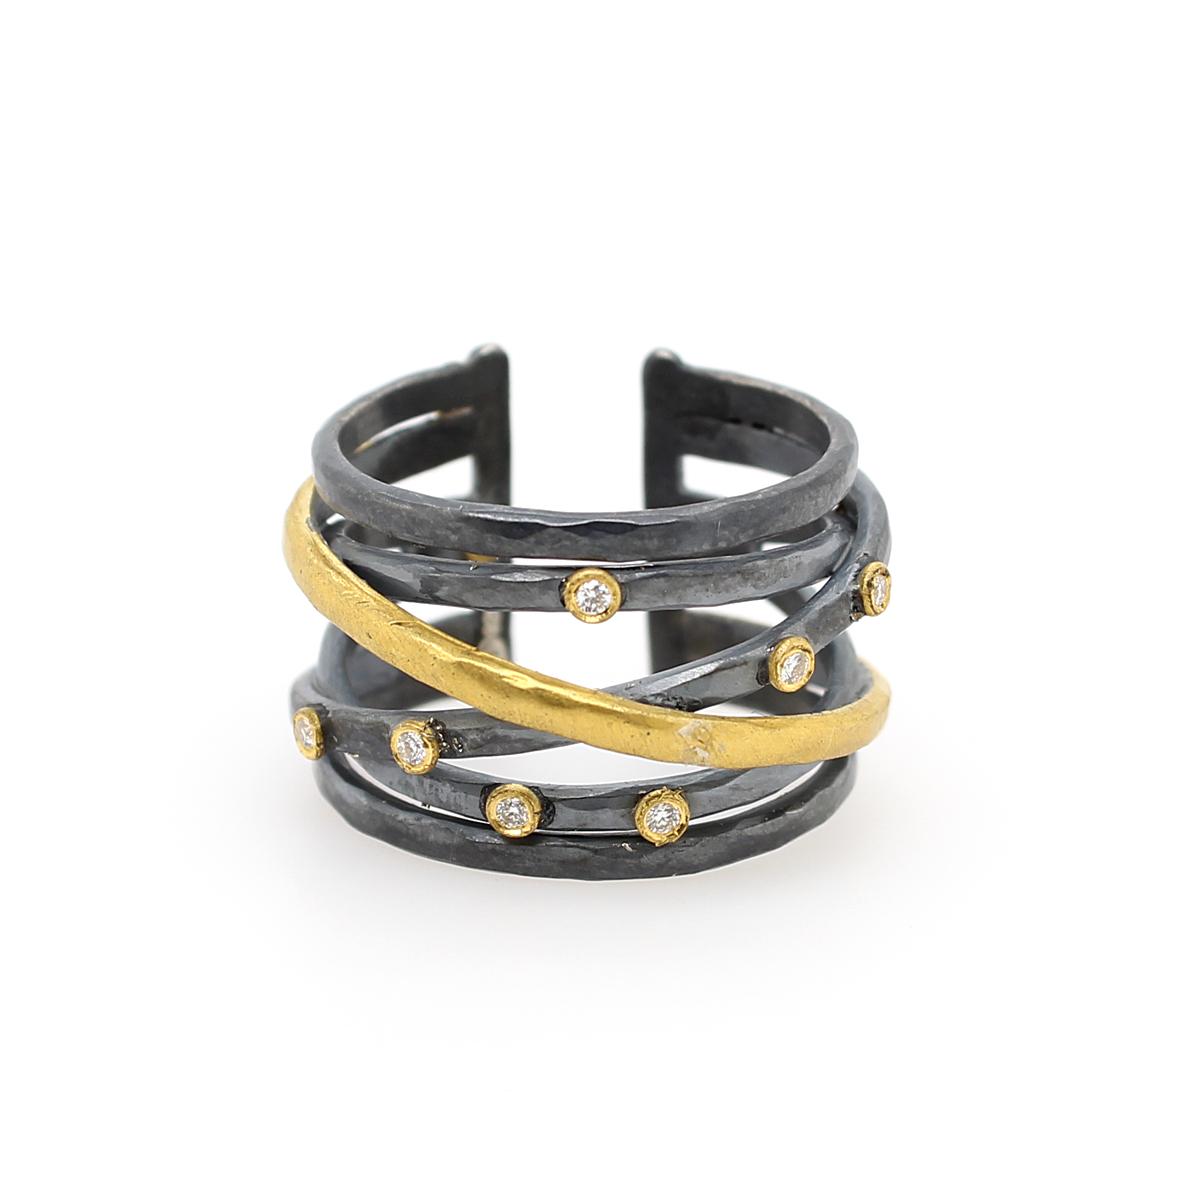 "Lika Behar 24 Karat Fusion Gold/Oxidized Silver Diamond ""Stockholm Crossover"" Open Back Ring"